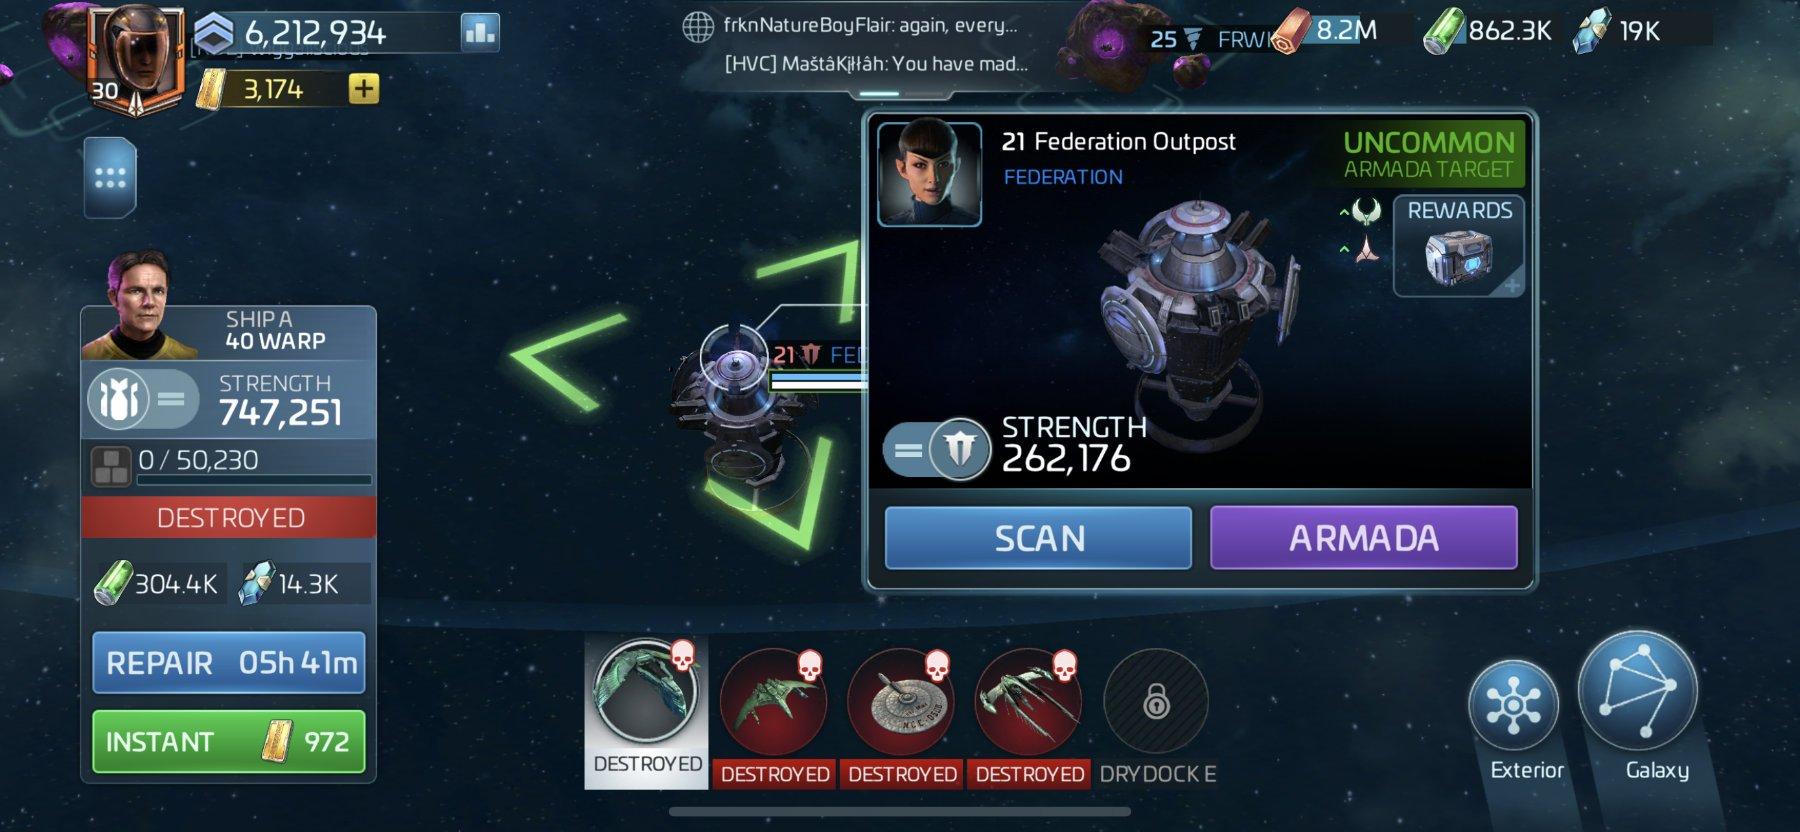 Star Trek Fleet Command Federation Armada Locations